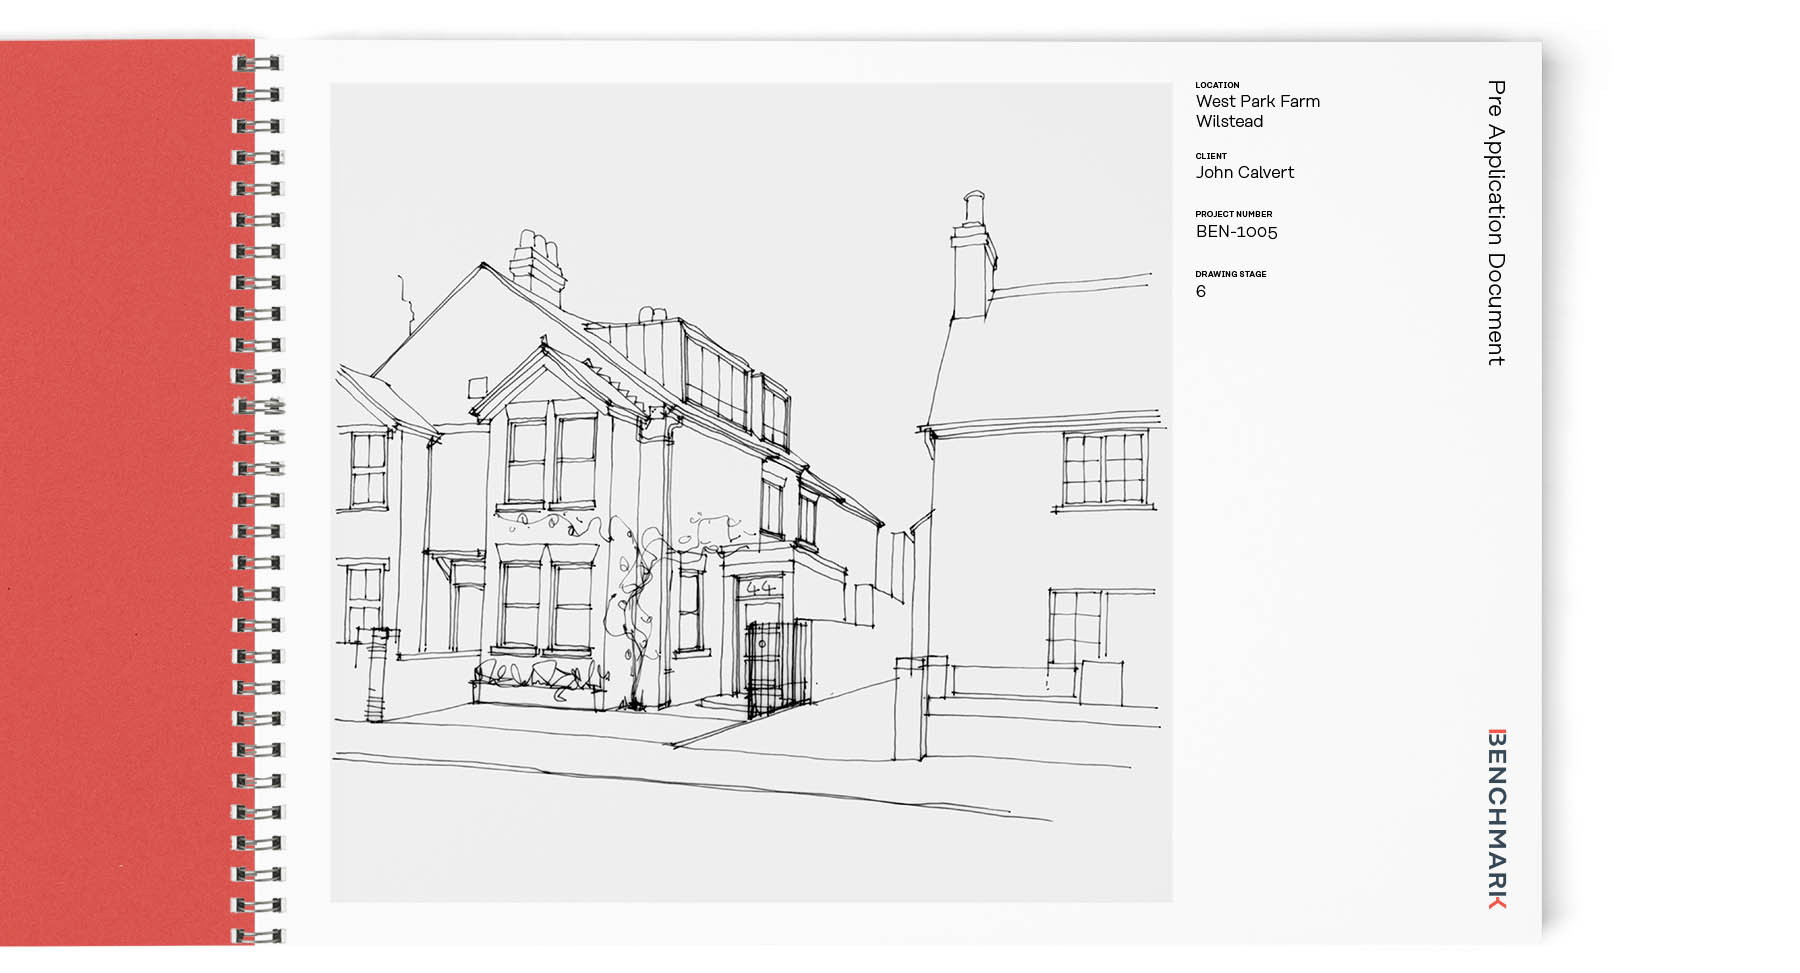 benchmark architects branding design by Leeds based Freelance Designer Neil Holroyd